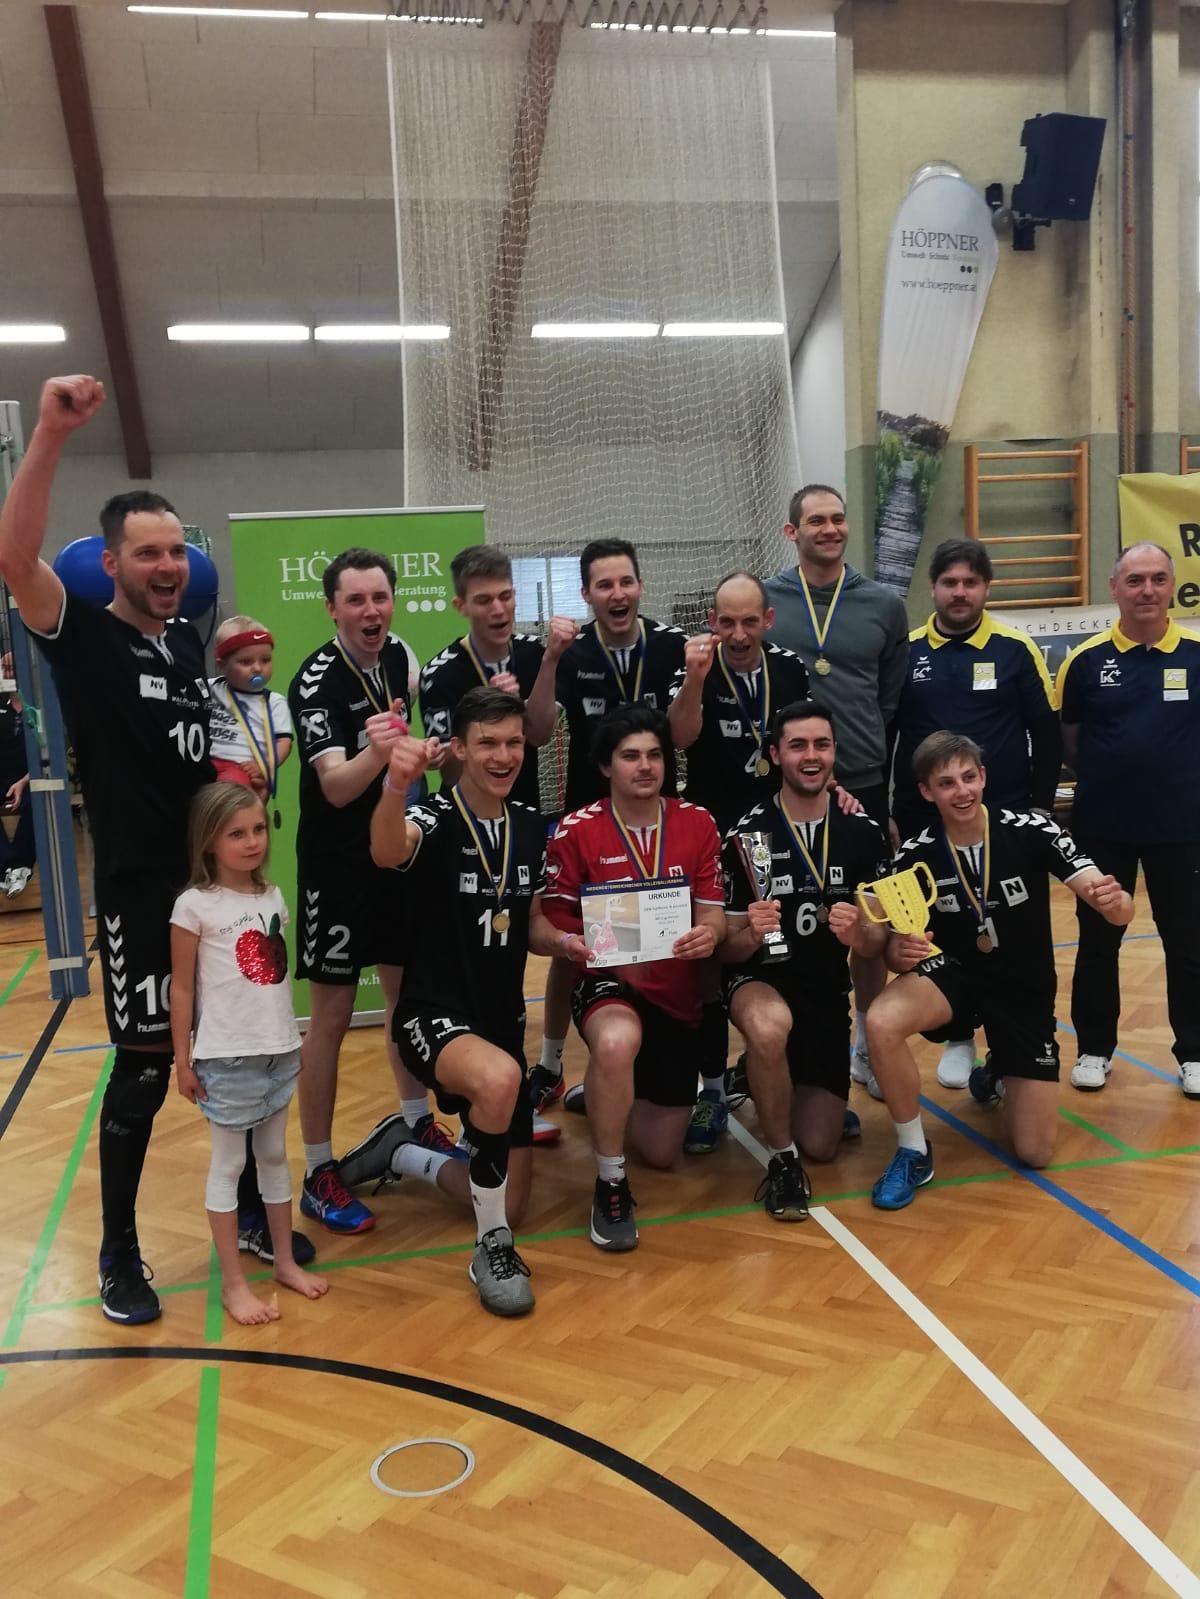 NÖ-Cup-Titel verteidigt